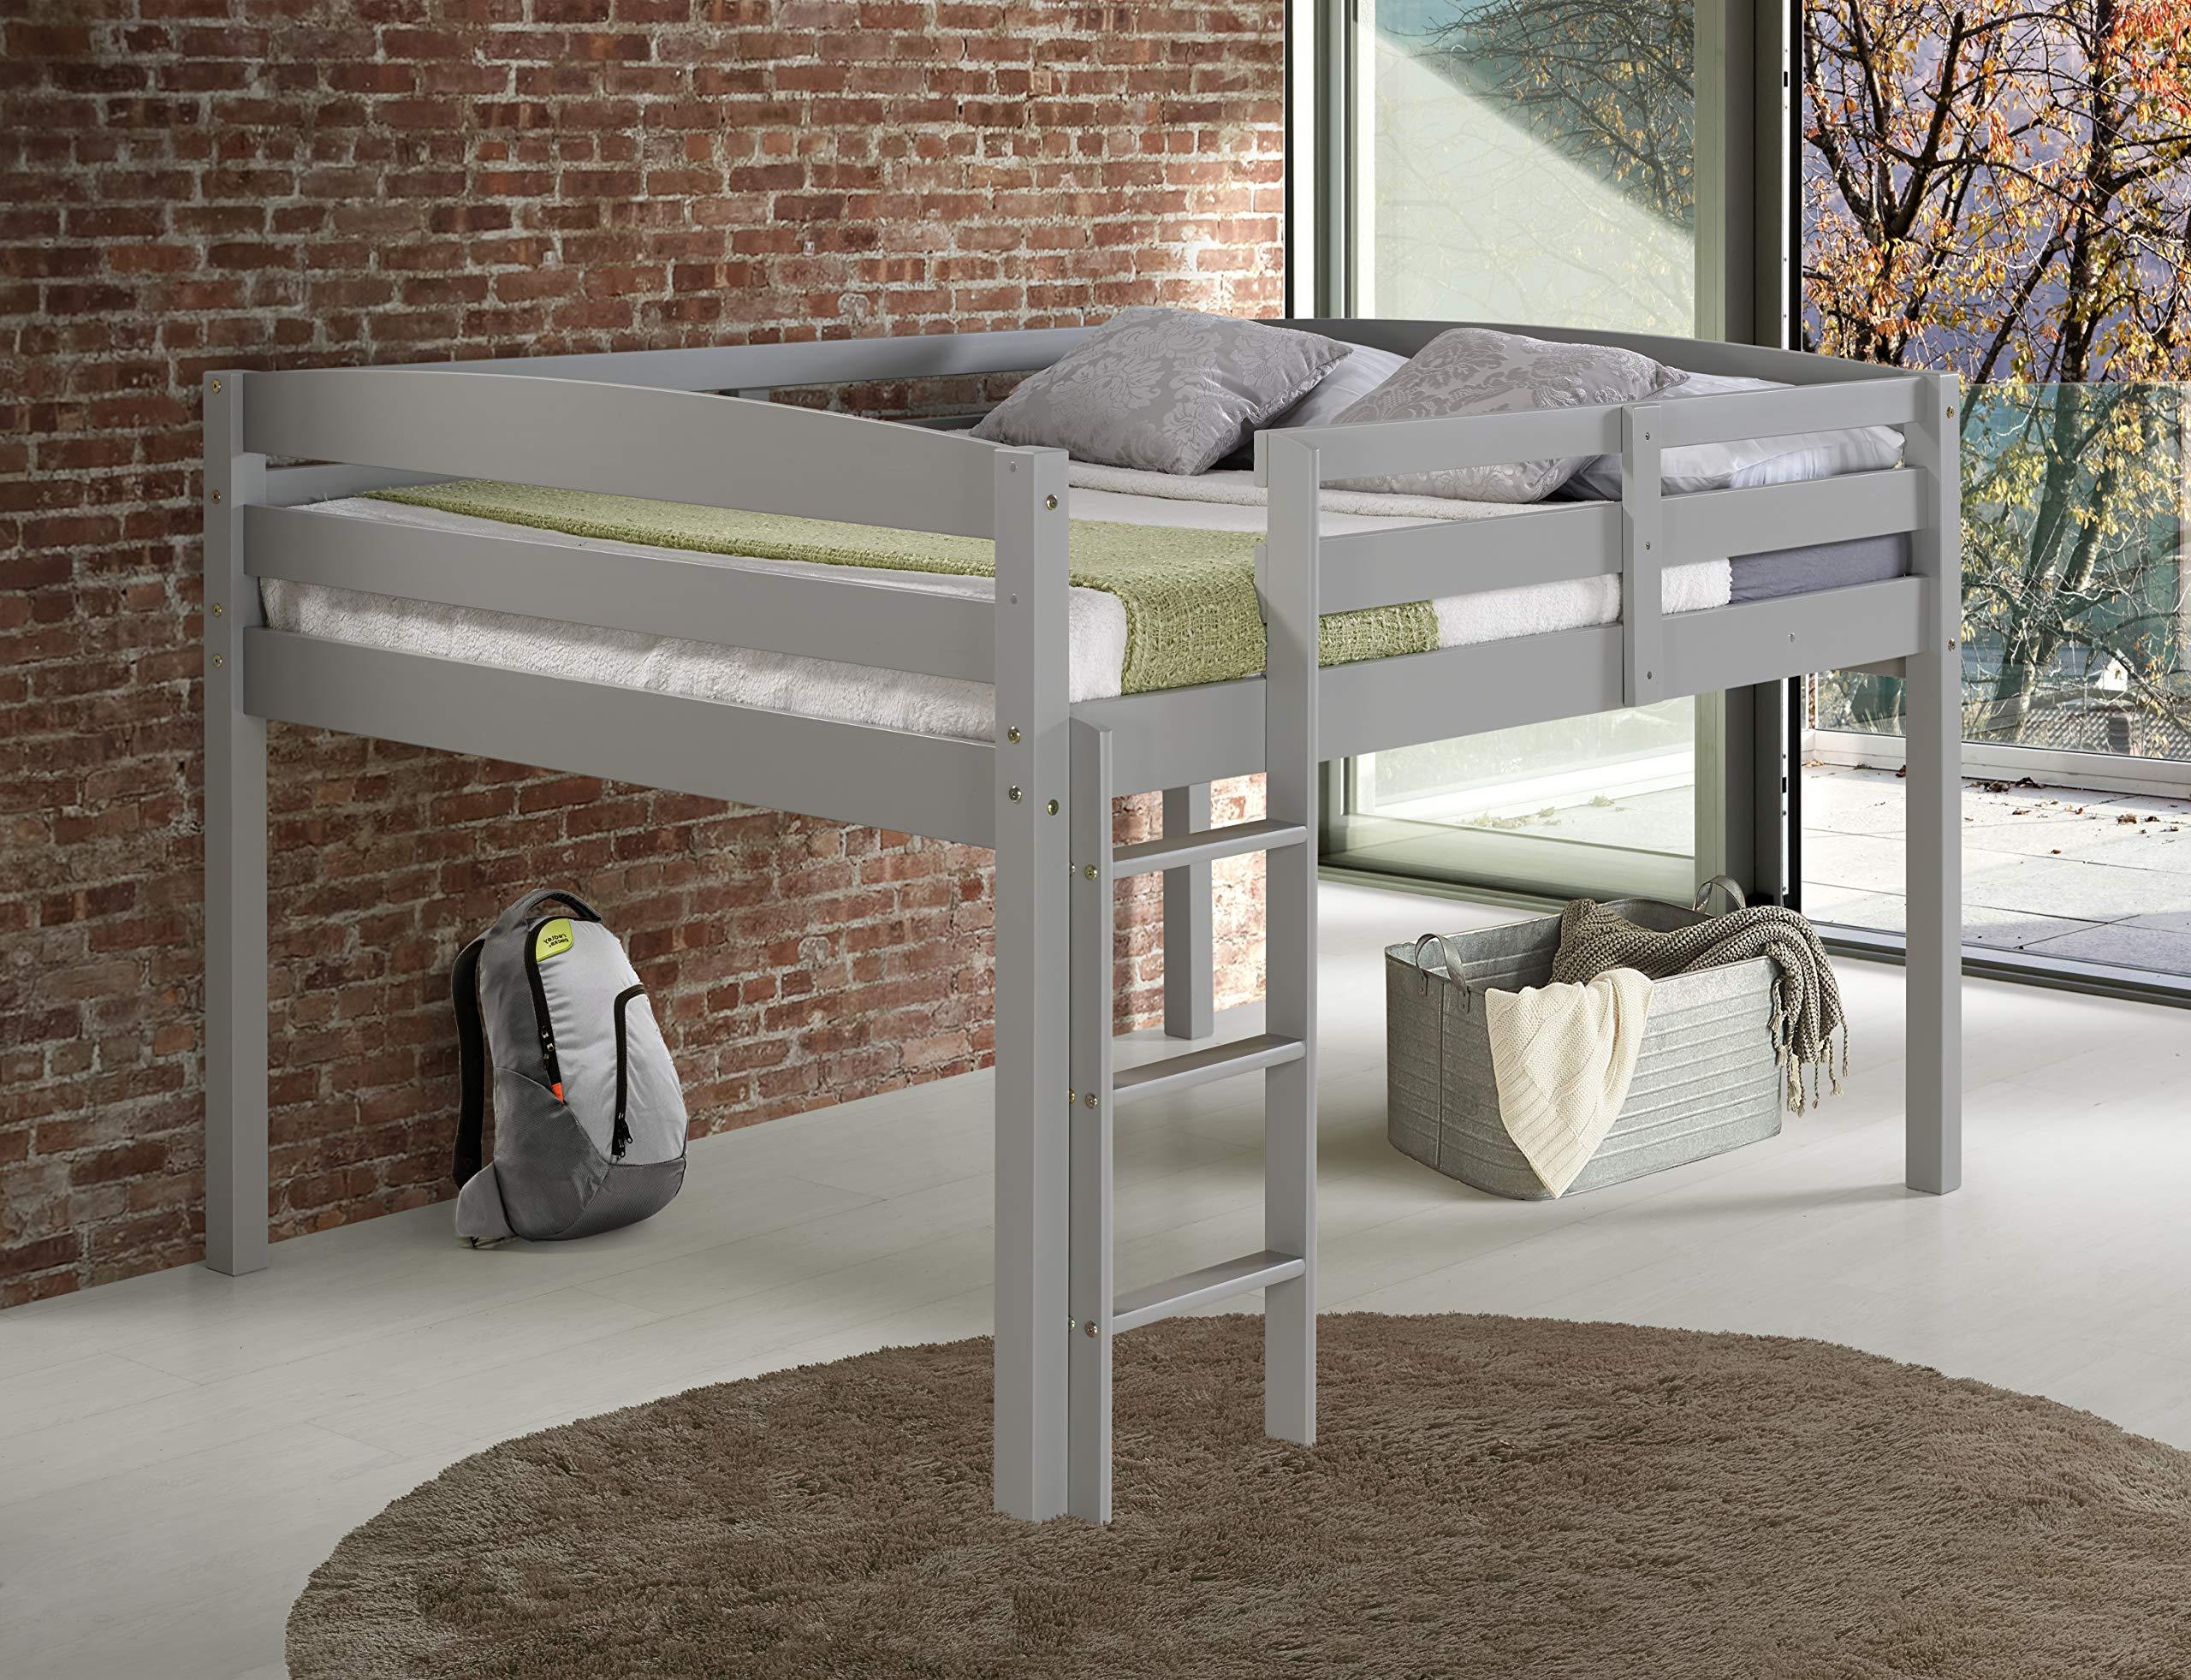 Concord T1304F Junior Loft Bed, Full, Grey by Concord